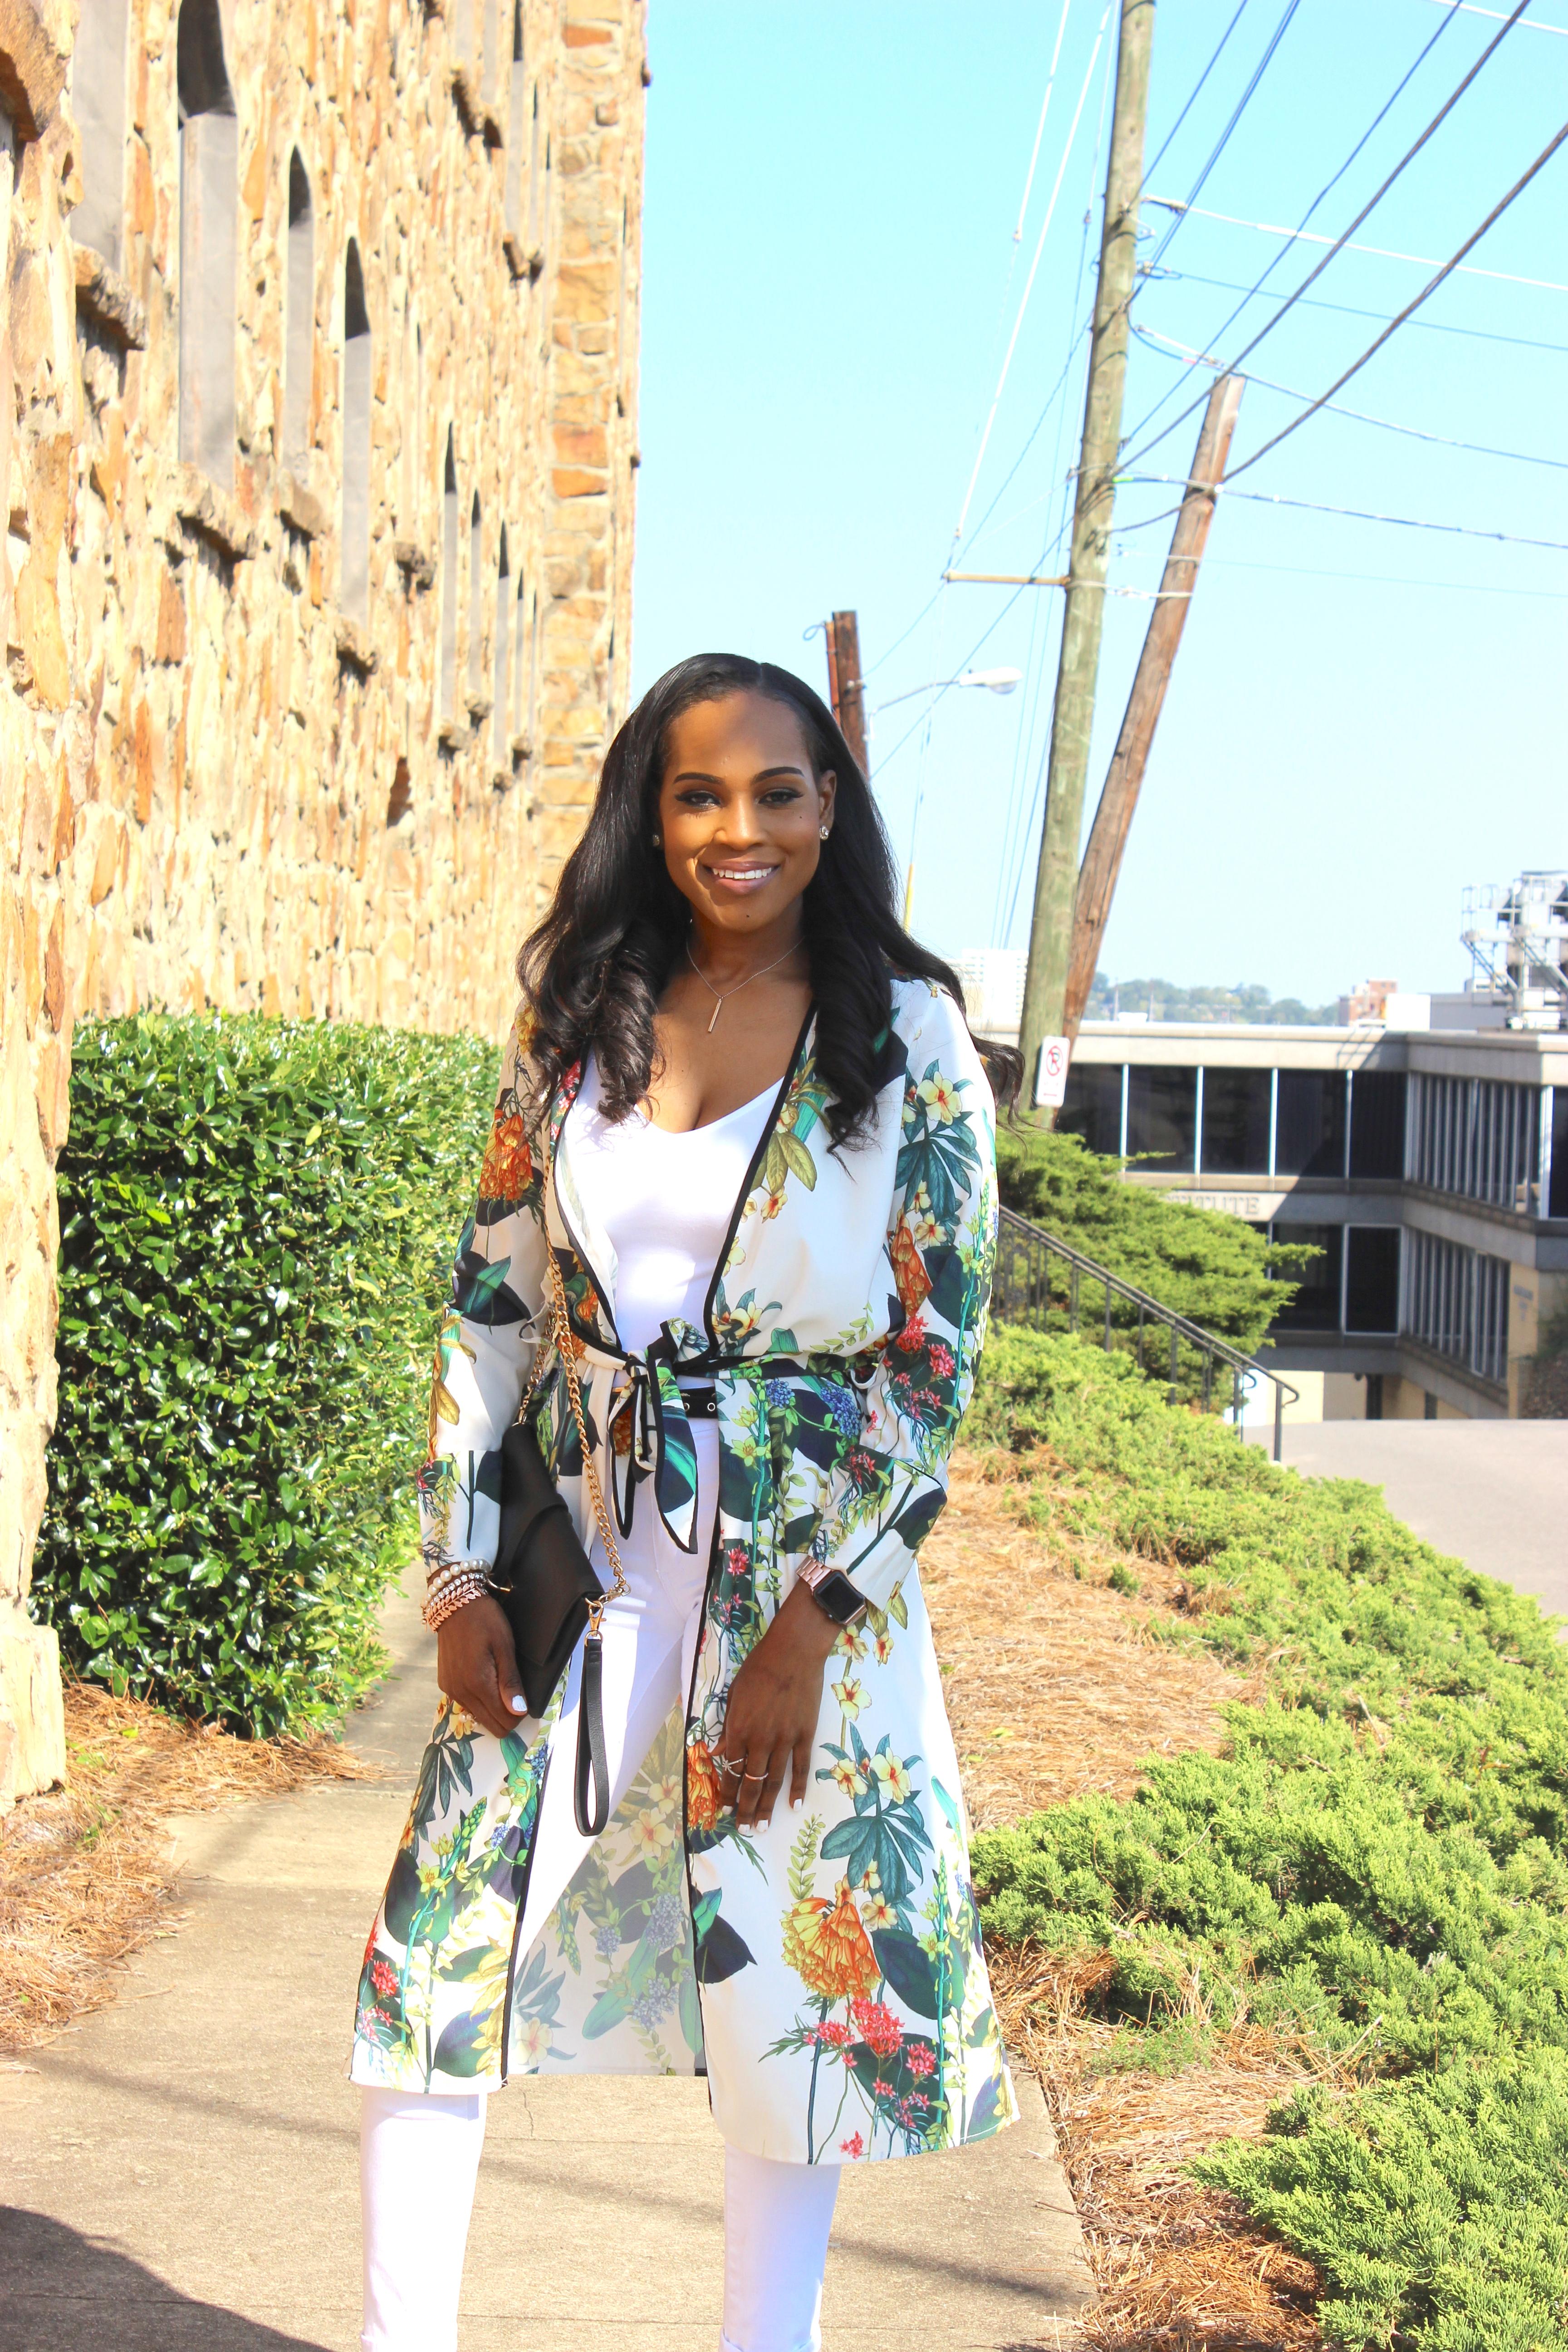 Style-files-White-Civil-Skinny-Jeans-forever-21-white-bodysuit-shein-white-floral-Open Front Longline Kimono -Cape-Ribbon-black-Meg Ankle Strap Beaded Heel-Cape-Ribbon-studded-ankle-strap-sandals-oohlalablog-10